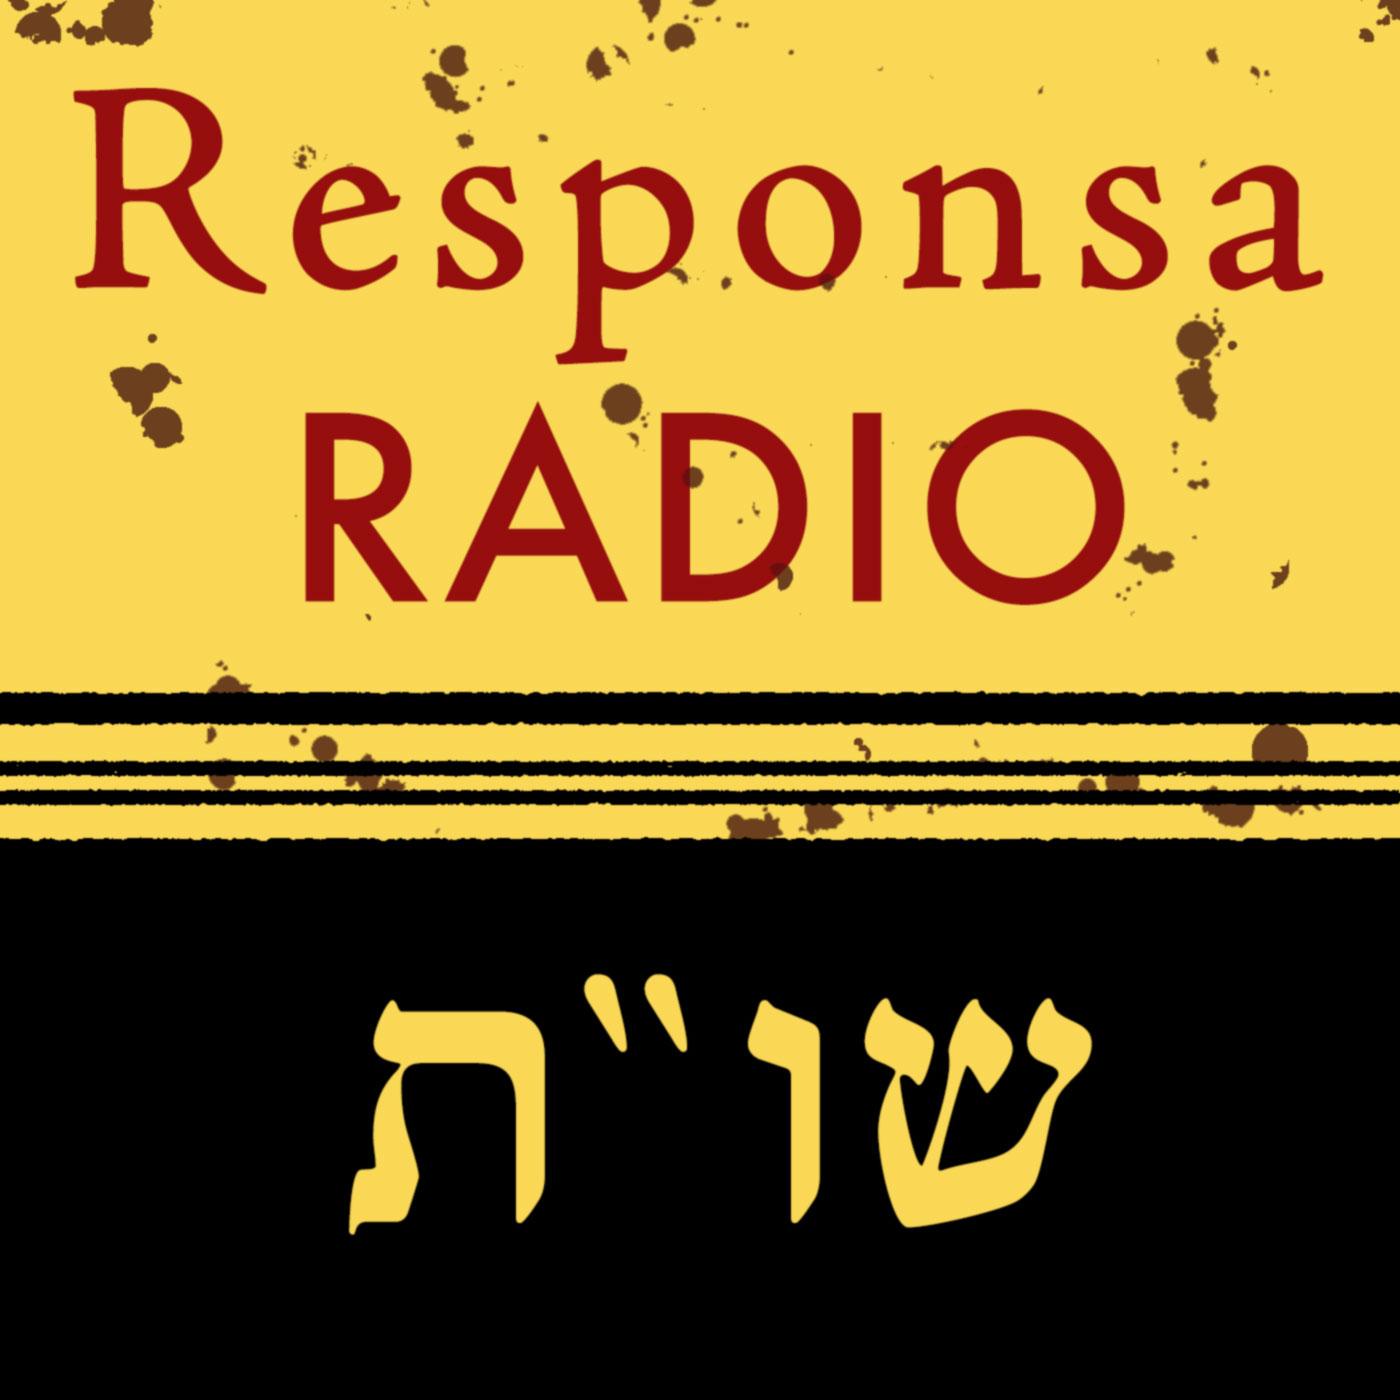 JPMedia: Responsa Radio